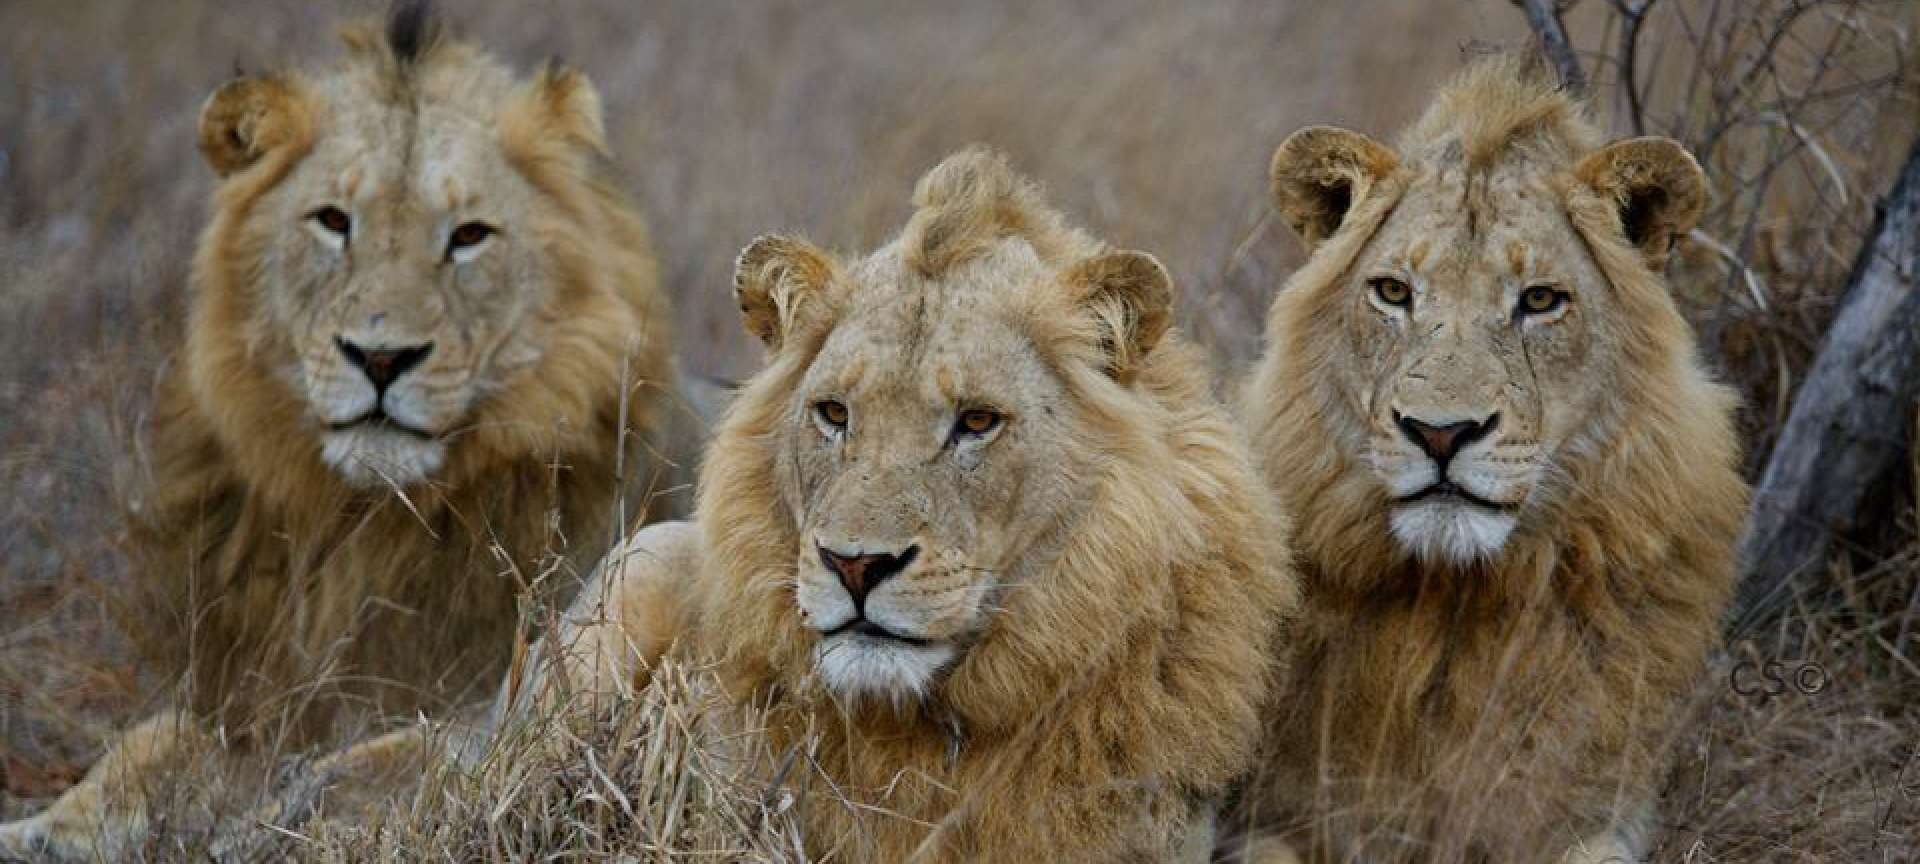 lions in the kruger national park wildlife safari